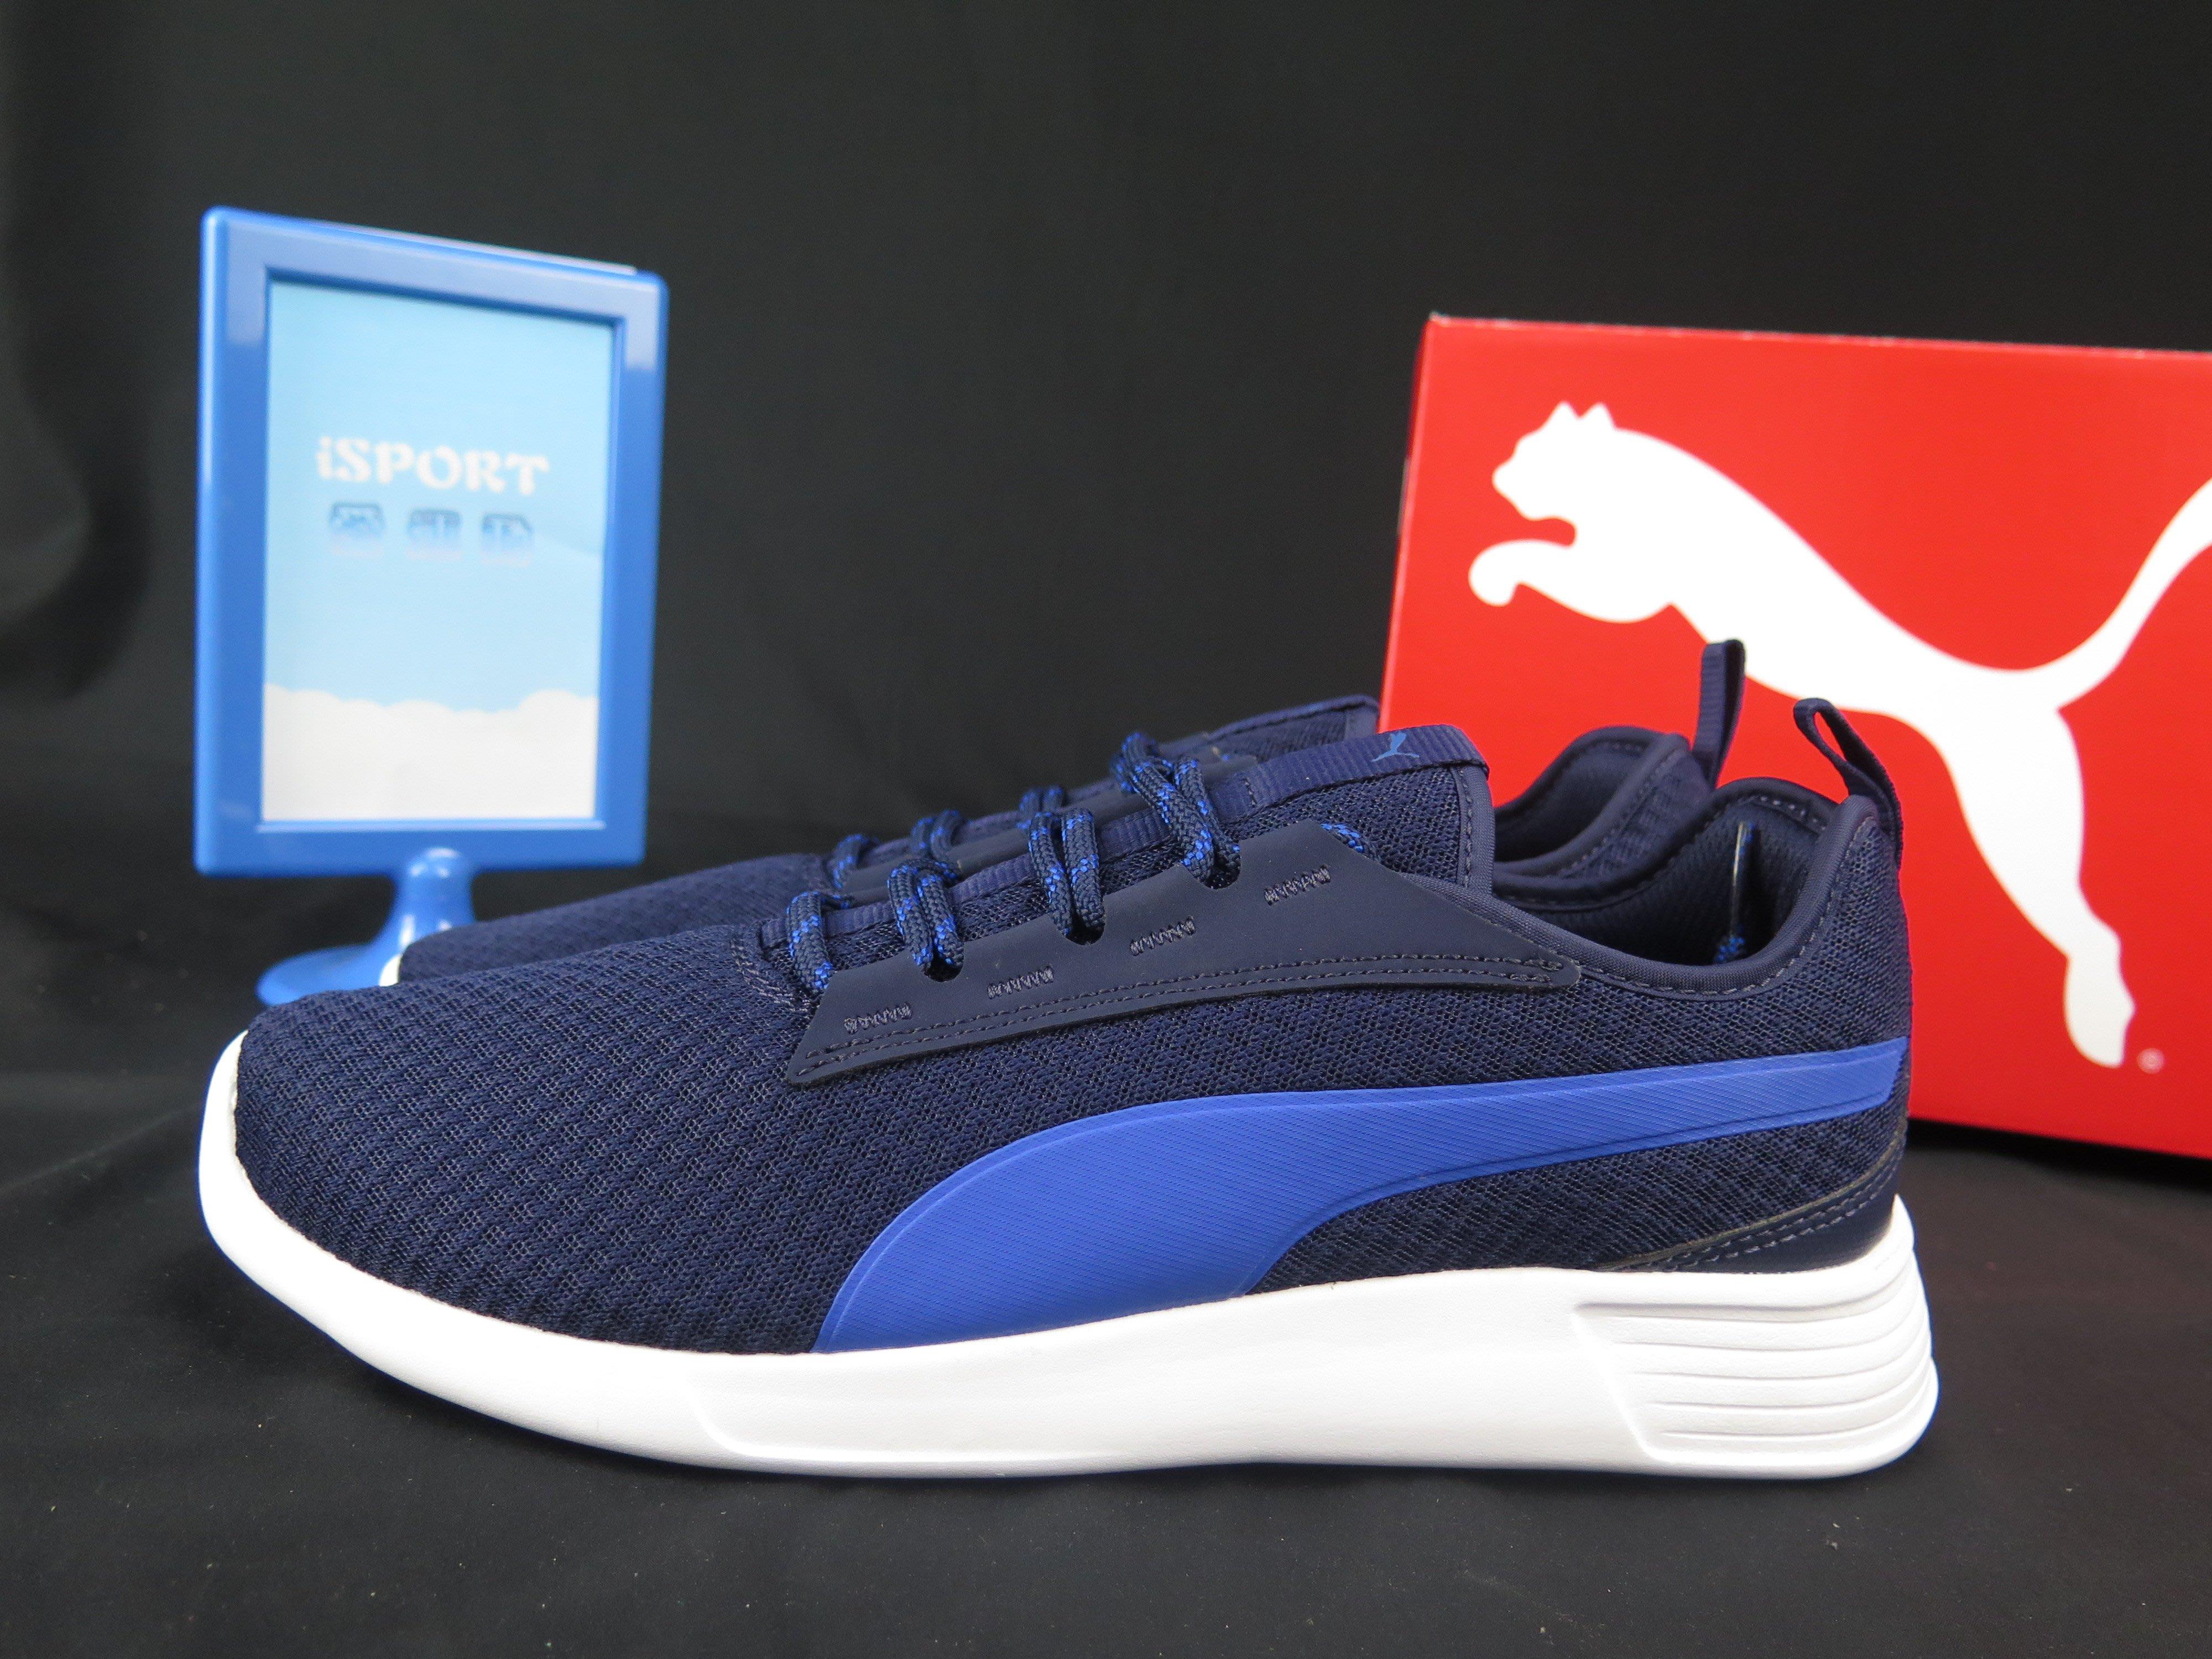 【iSport愛運動】PUMA ST TRAINER EVO V2 休閒鞋  正品 36374210 男款